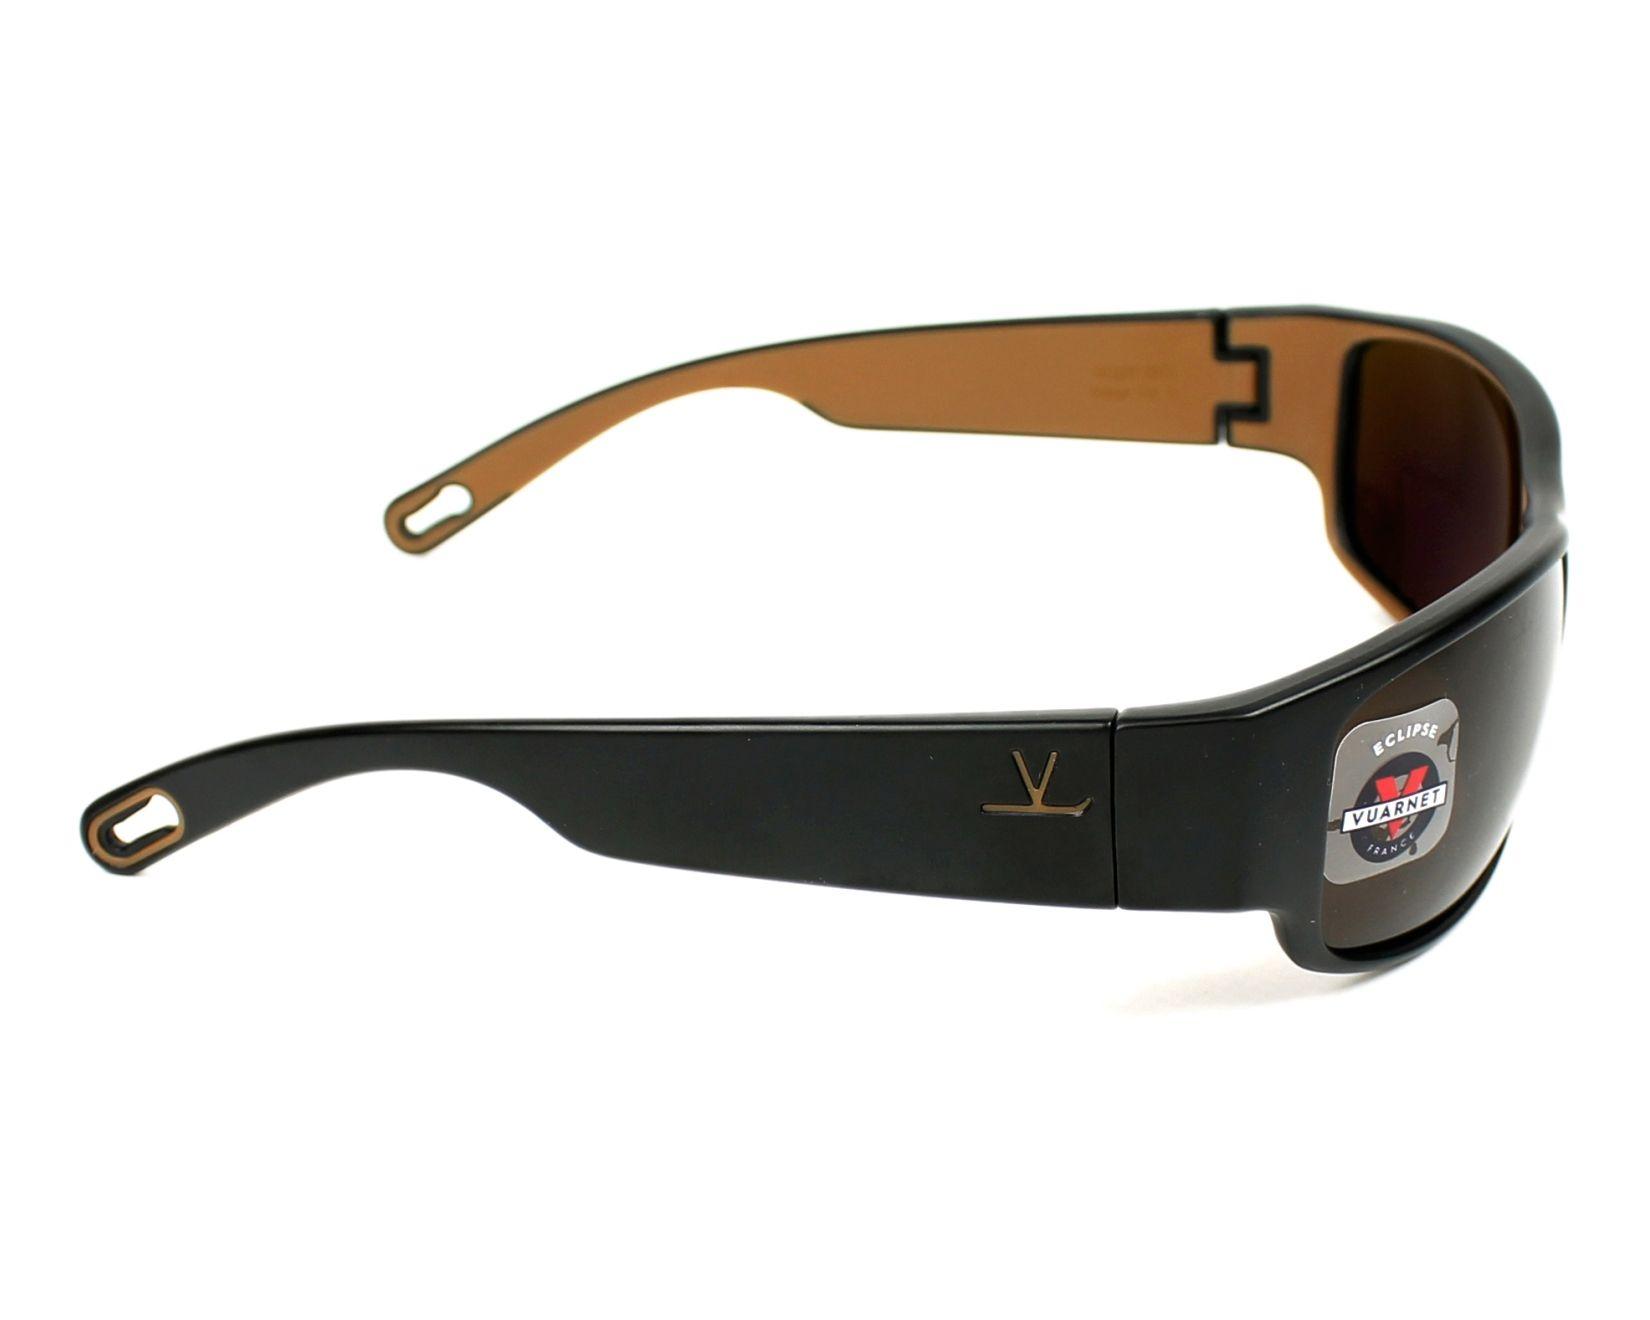 00e01f1f6e Sunglasses Vuarnet VL-1621 0001-2182 65-17 Black Brown side view